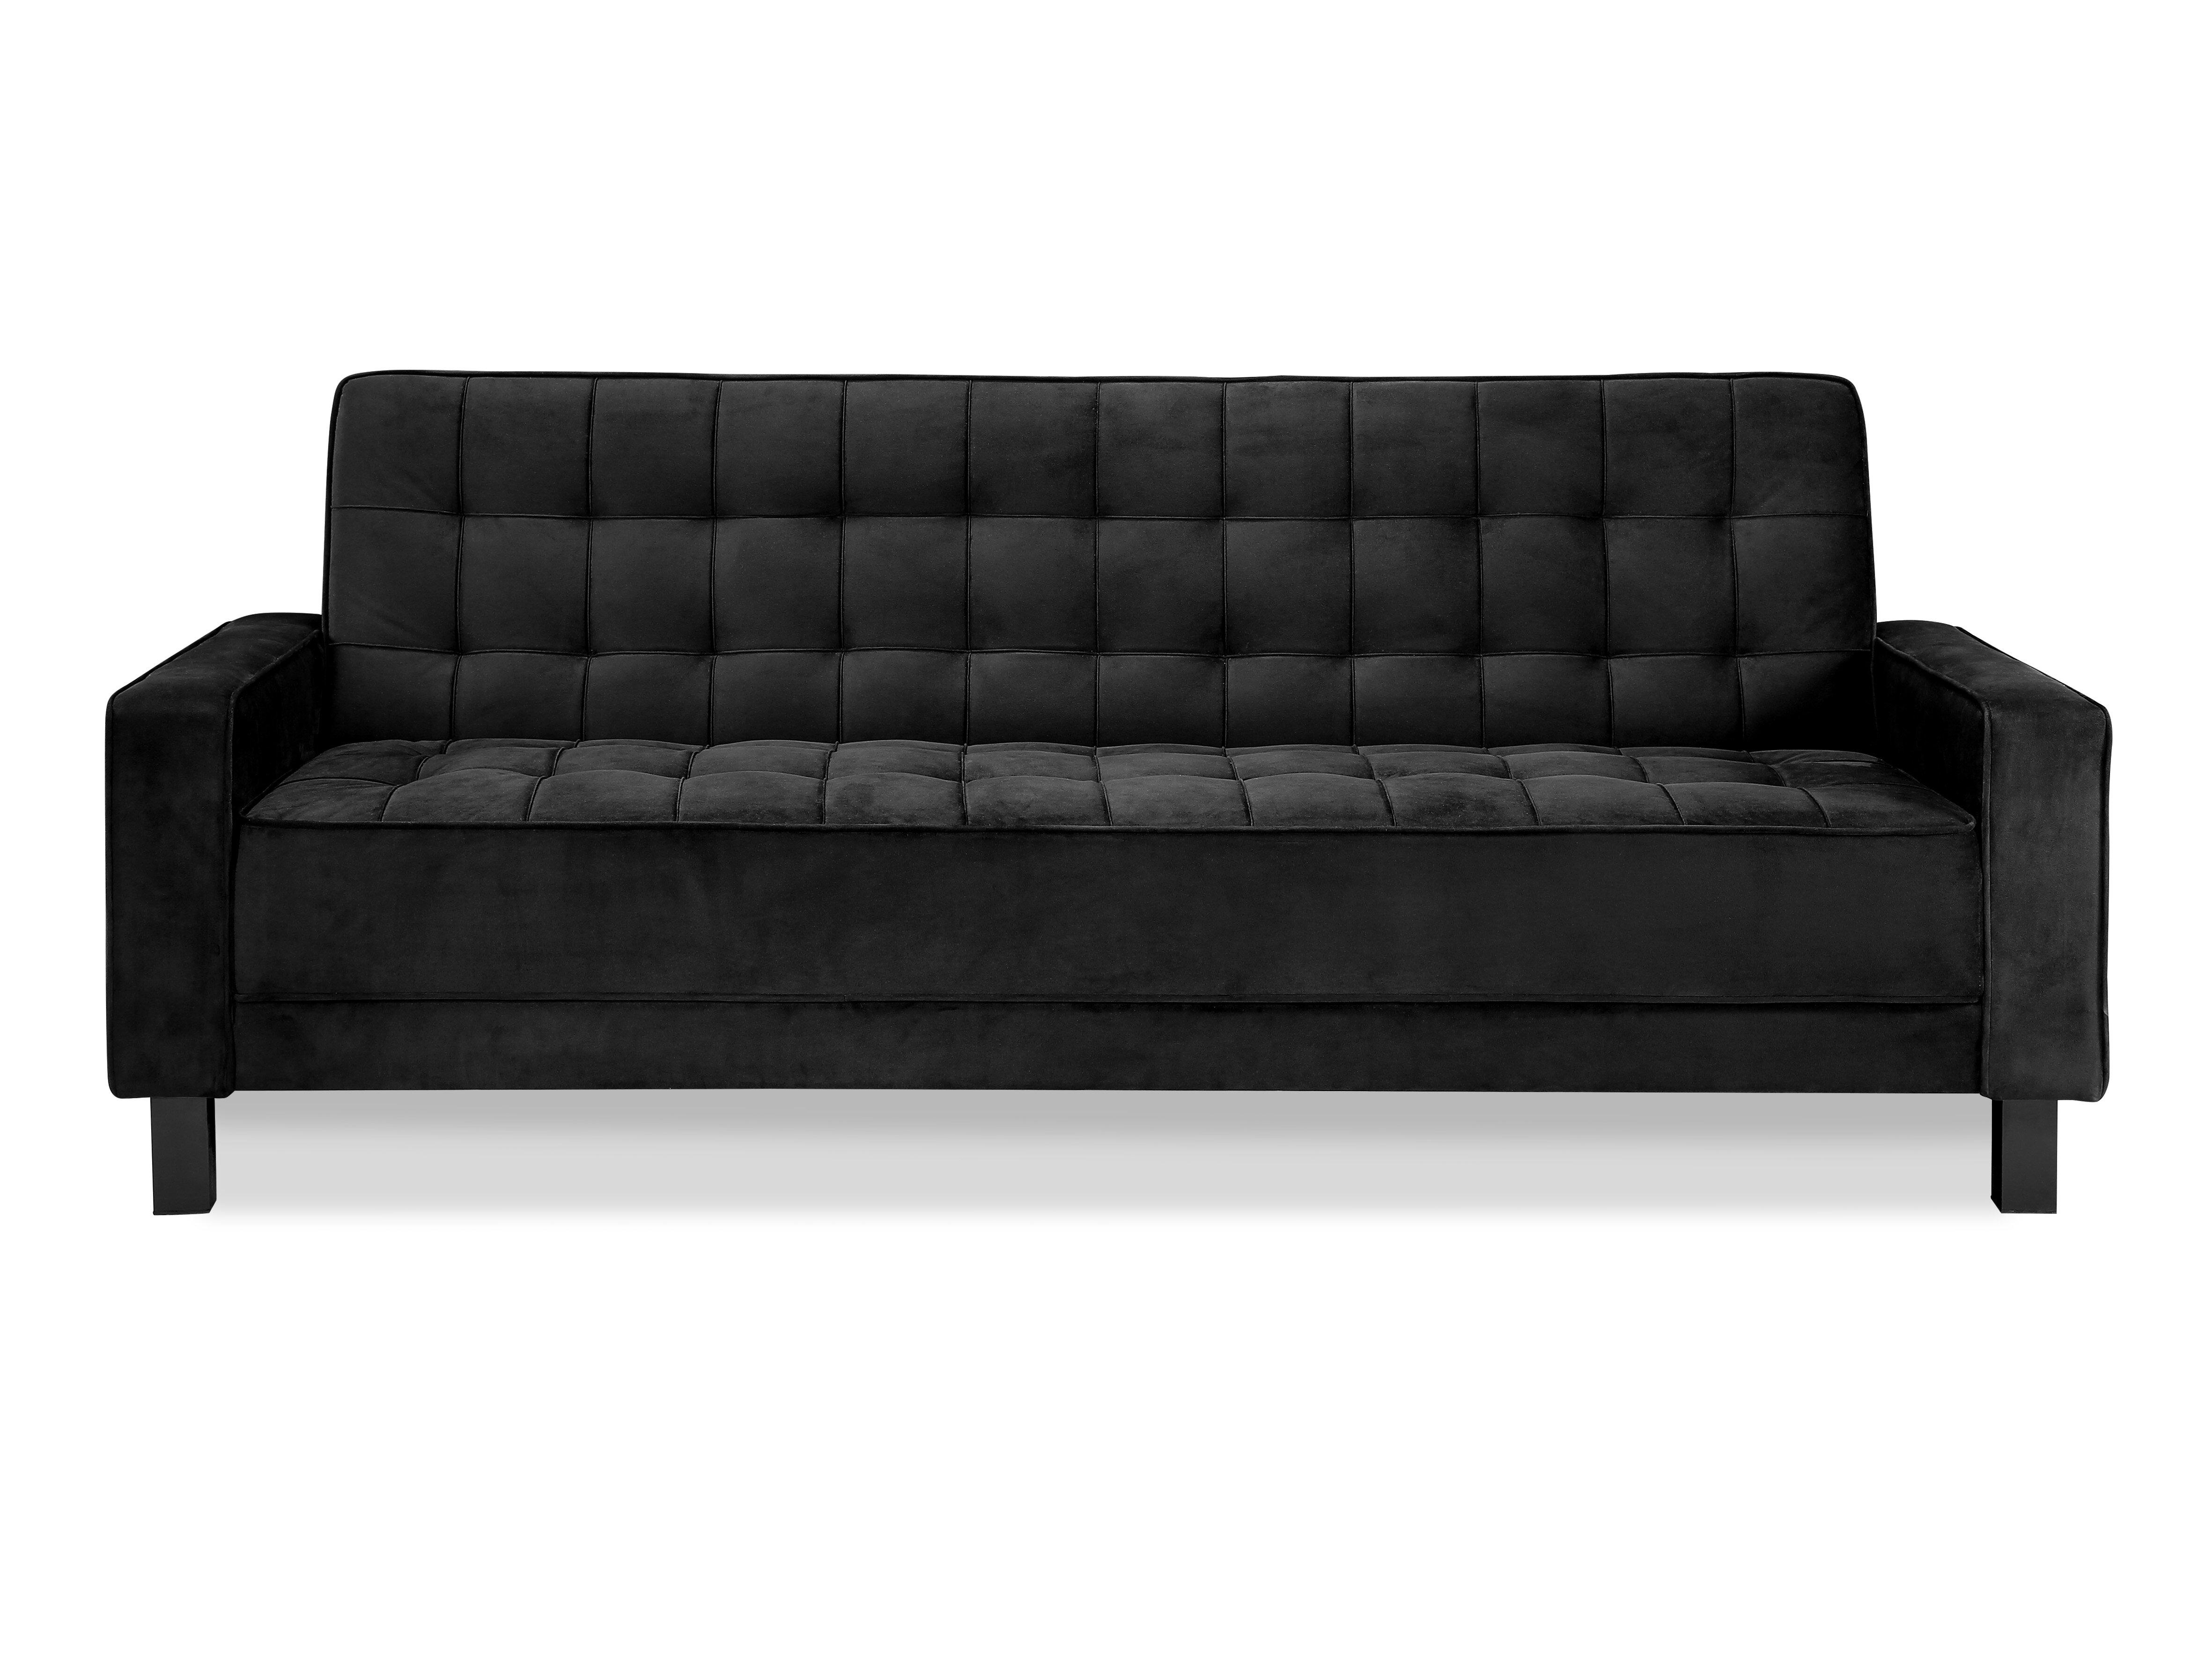 Serta Futons Manhattan Sleeper Sofa U0026 Reviews   Wayfair